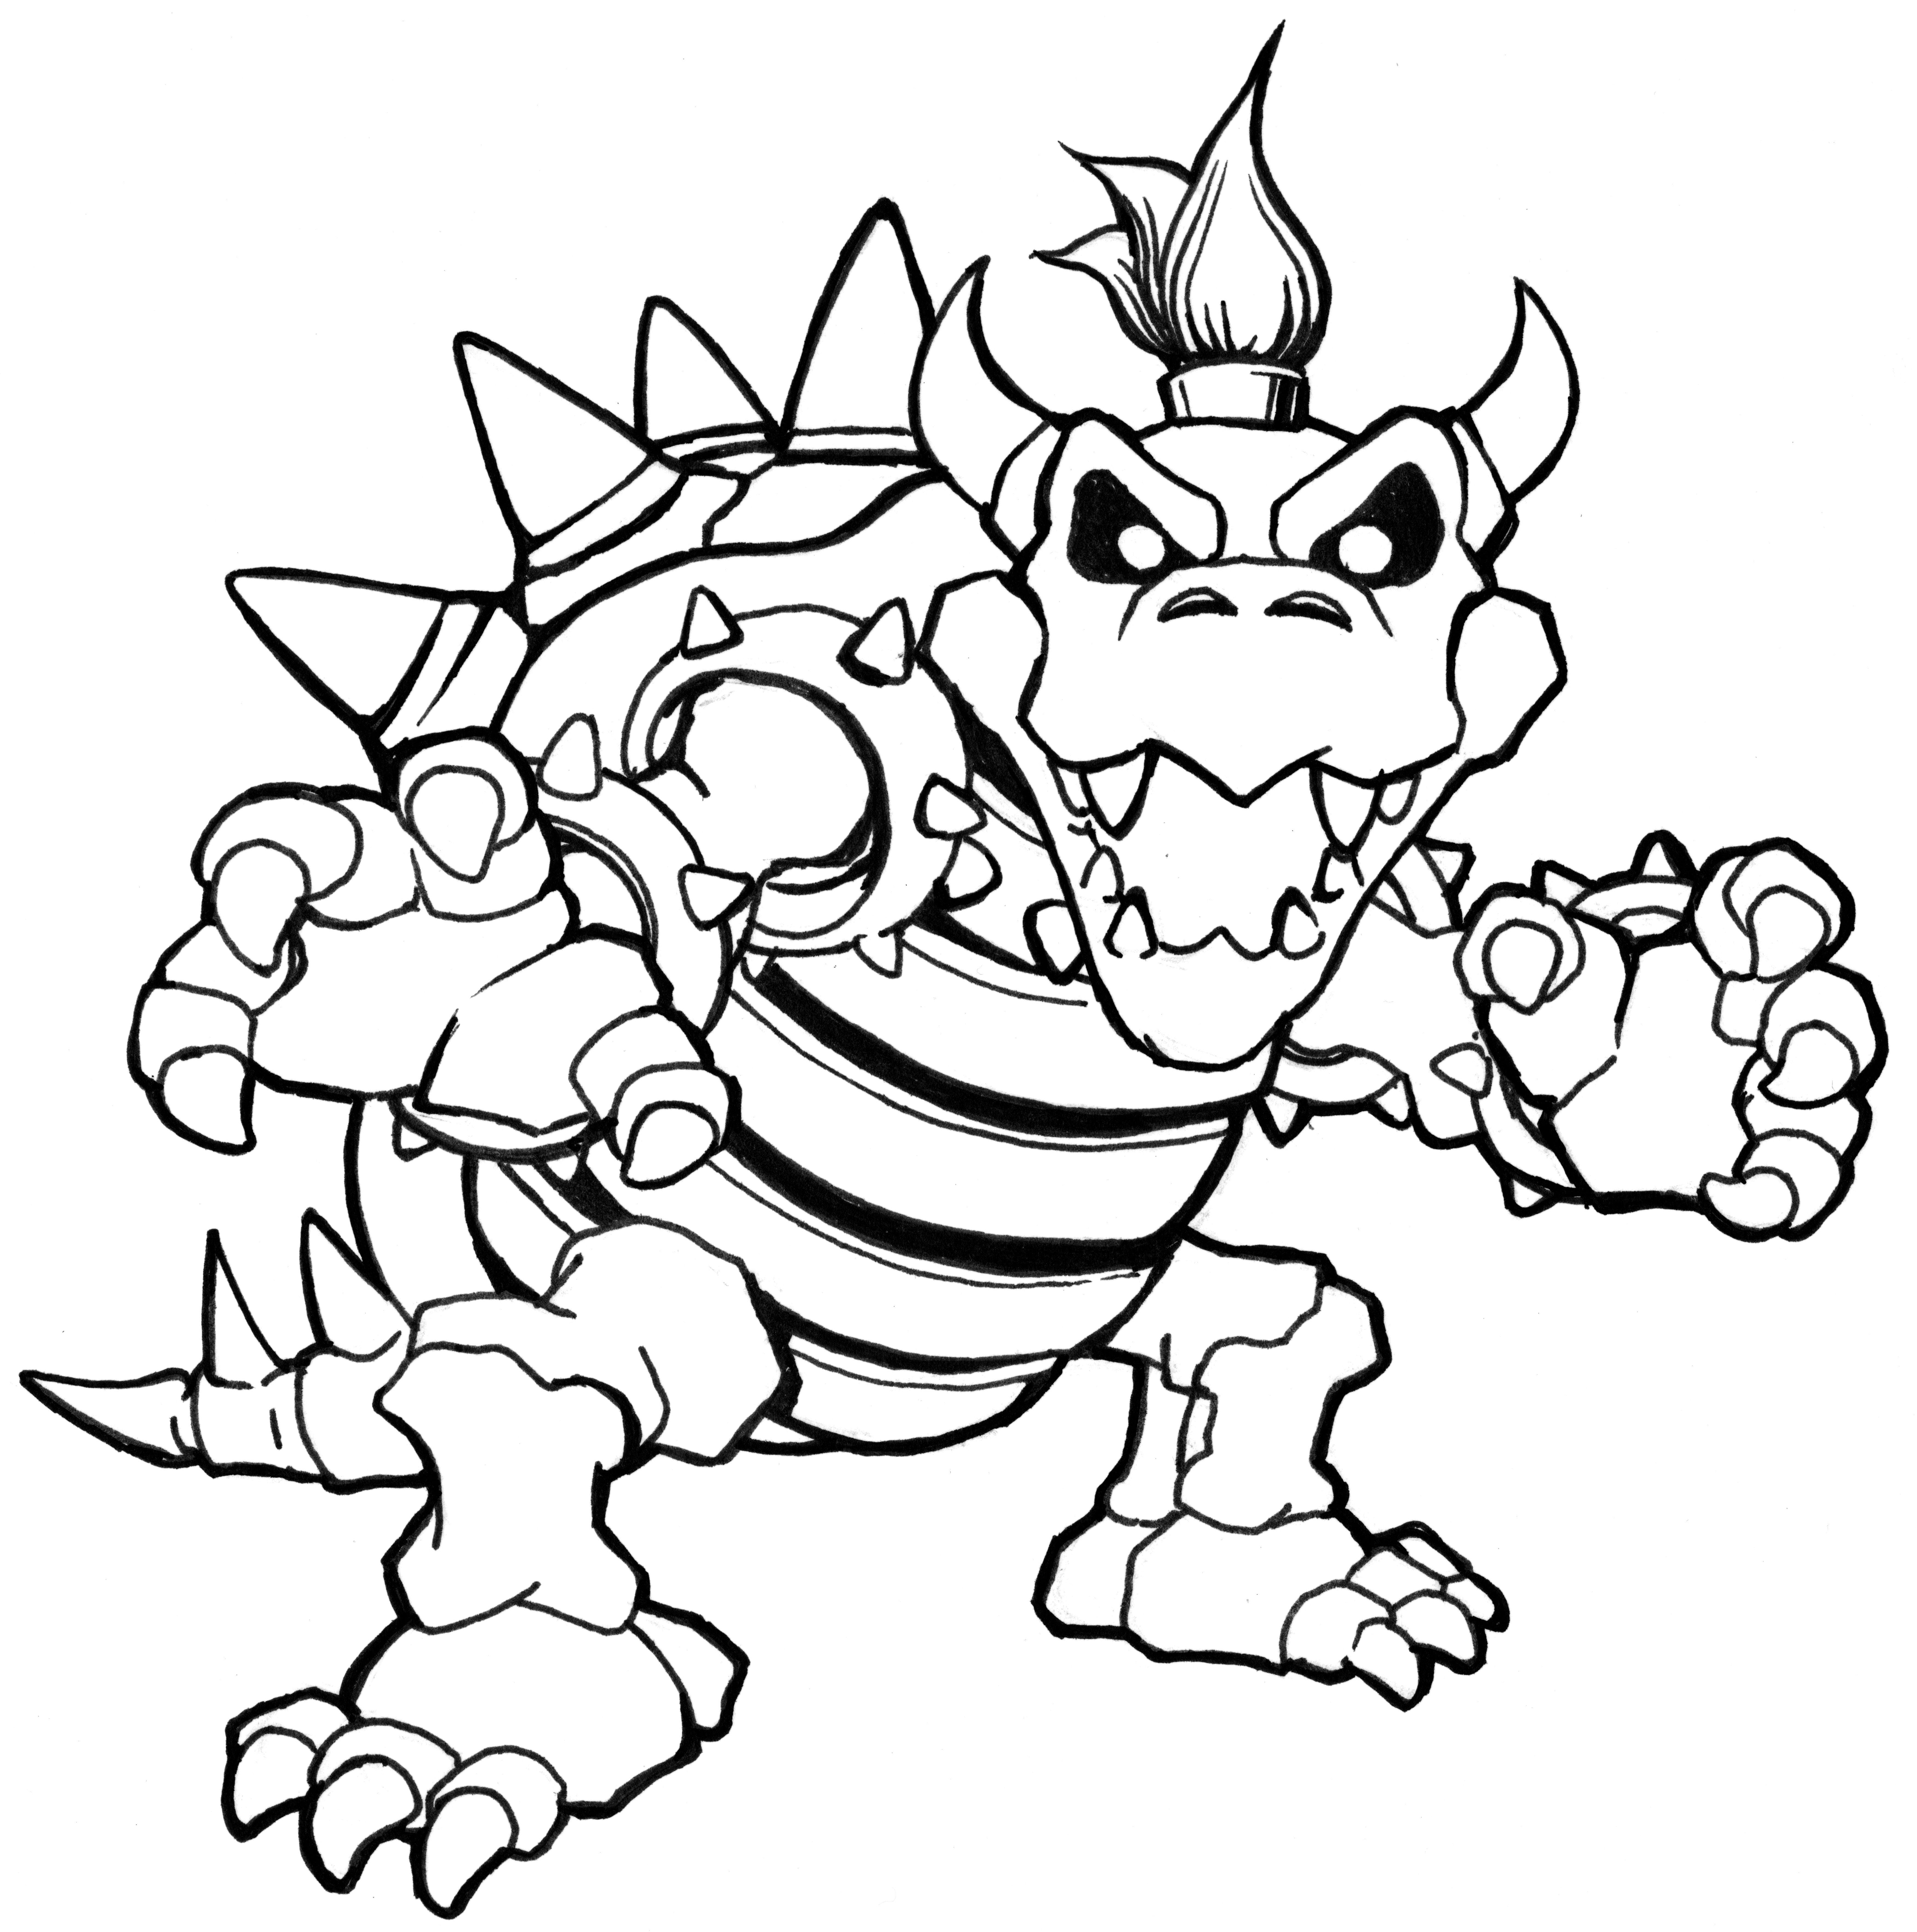 Bowser Coloring Bowser Coloring Pages Bowser Mario Coloriage Image Coloriage Coloriage Chat A Imprimer